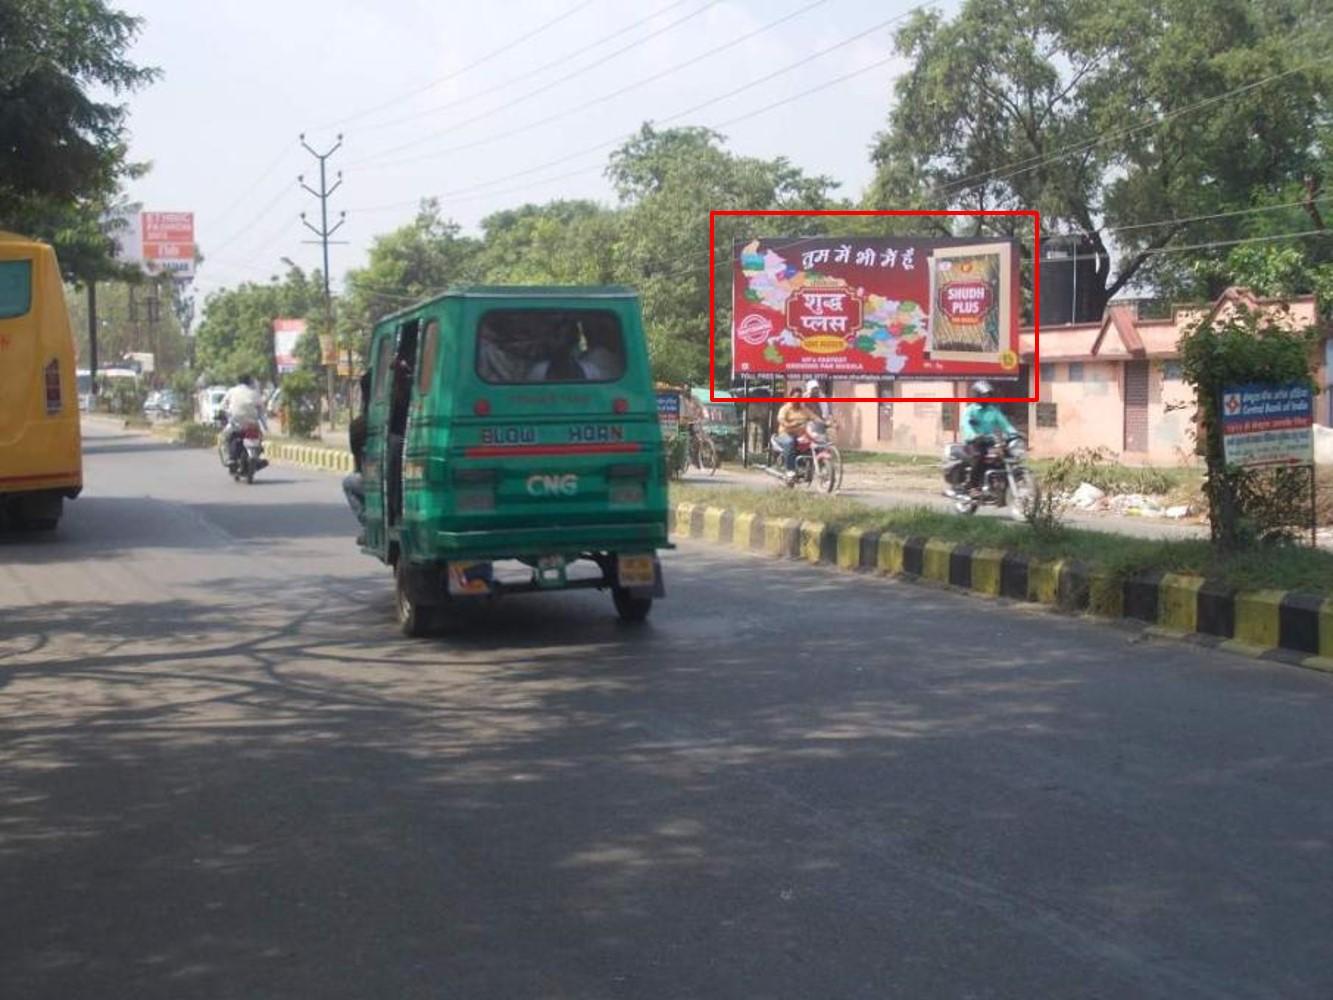 Gurudev palace Xing Near Polytechnic, Kanpur